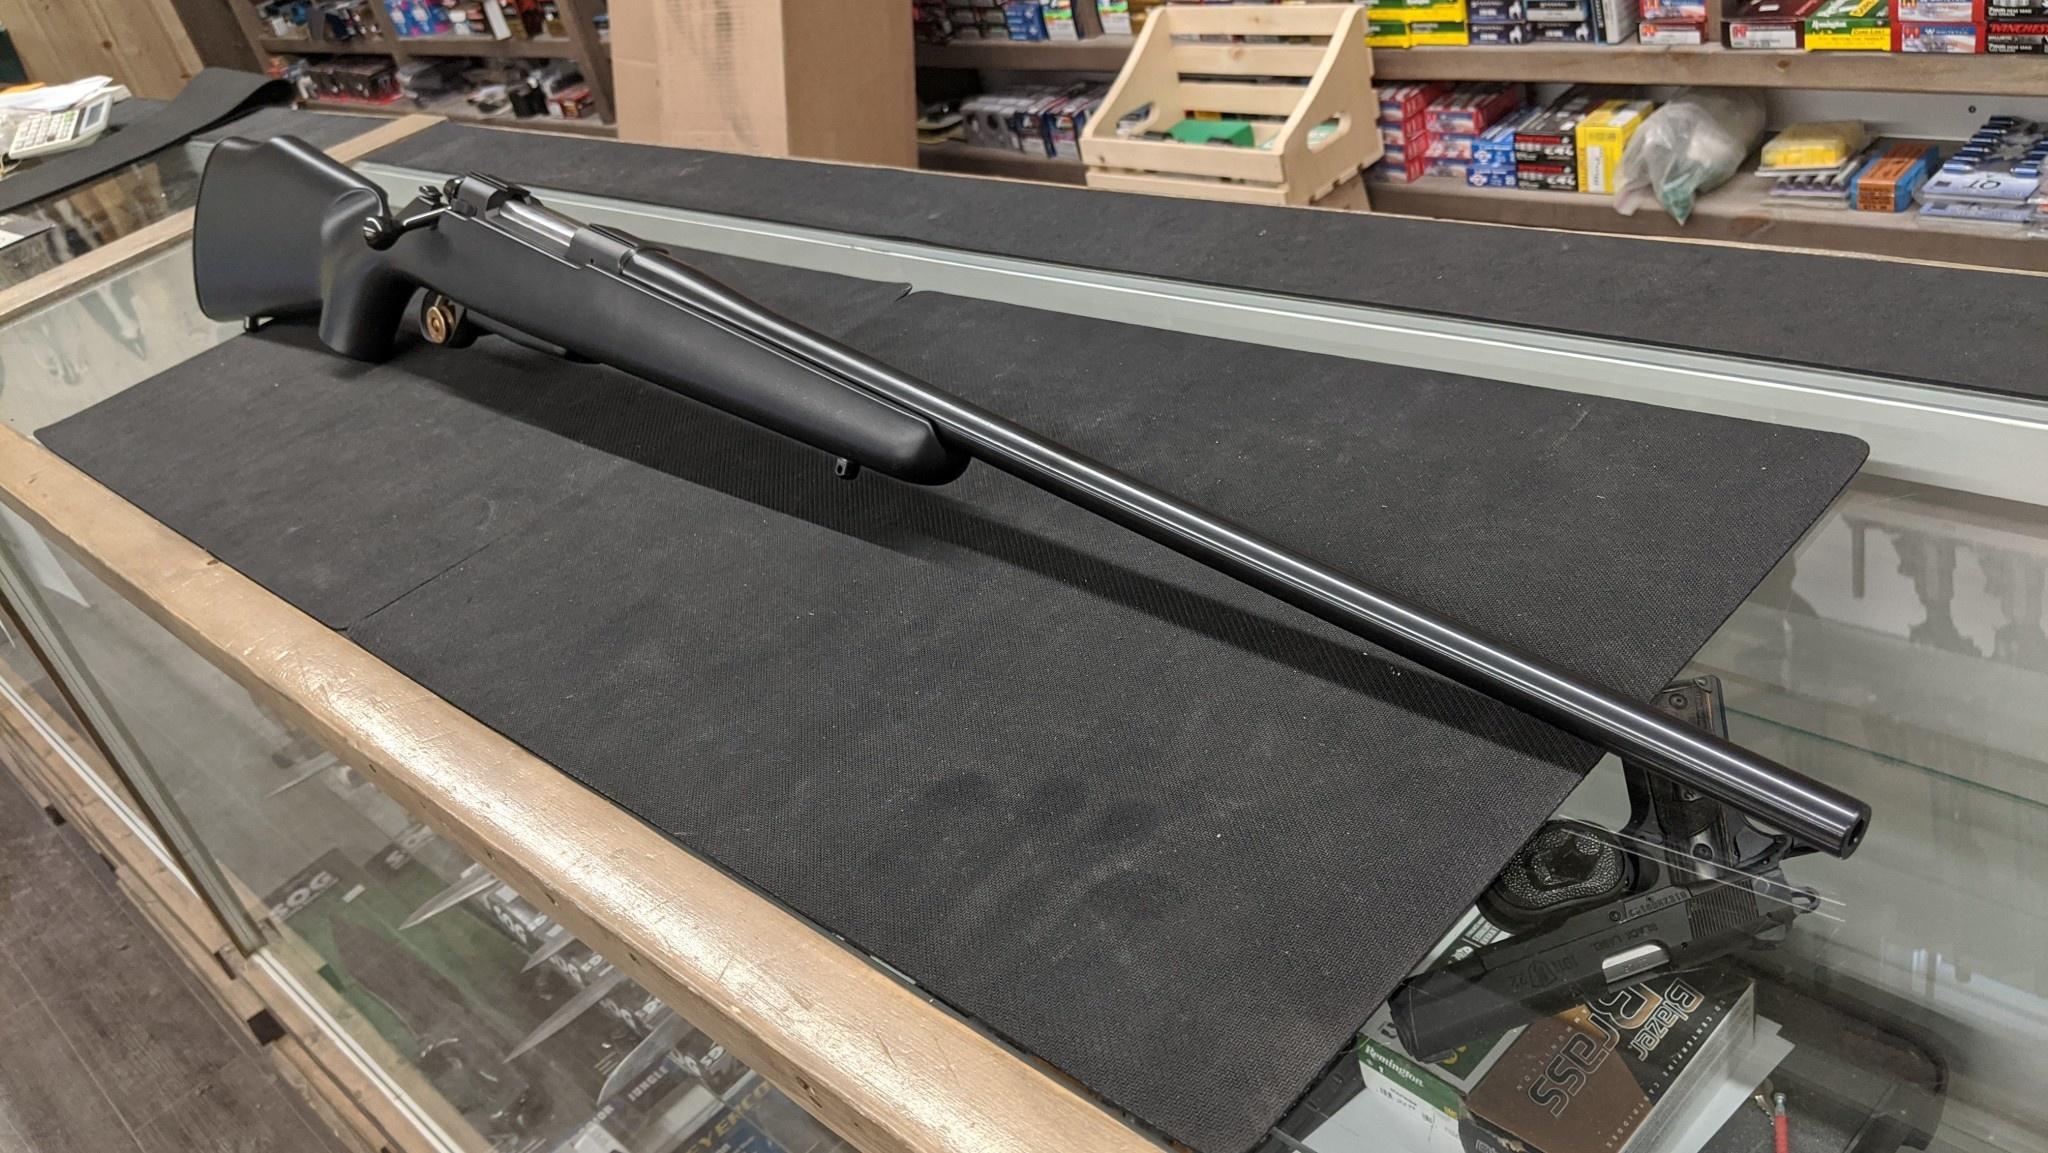 Sako M995 .300 Win. Rifle